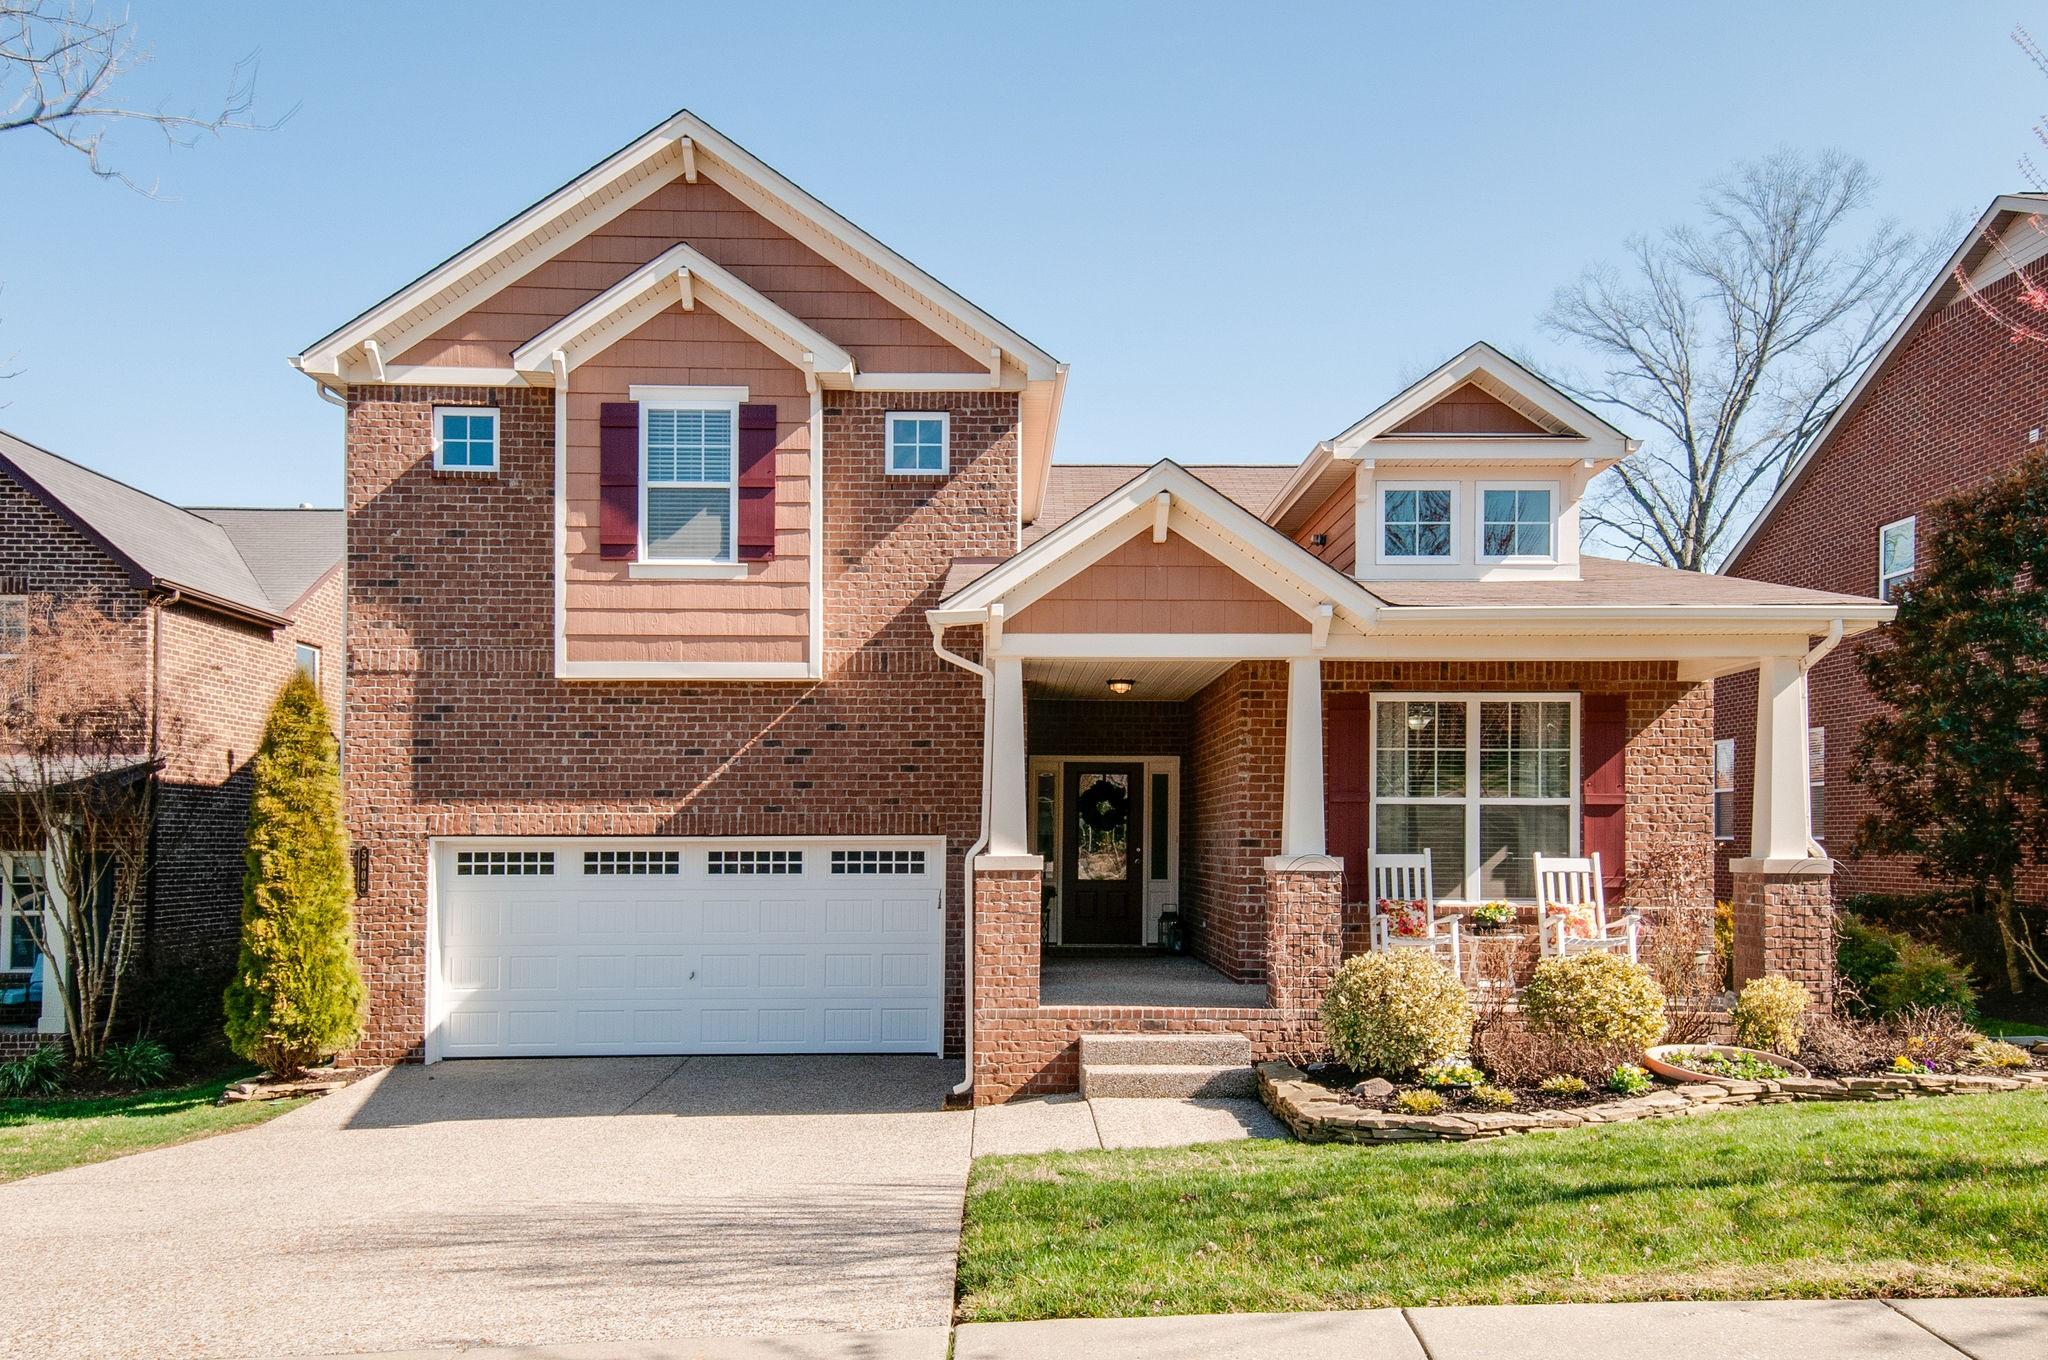 5009 Maxwell Landing Dr, Nolensville, TN 37135 - Nolensville, TN real estate listing